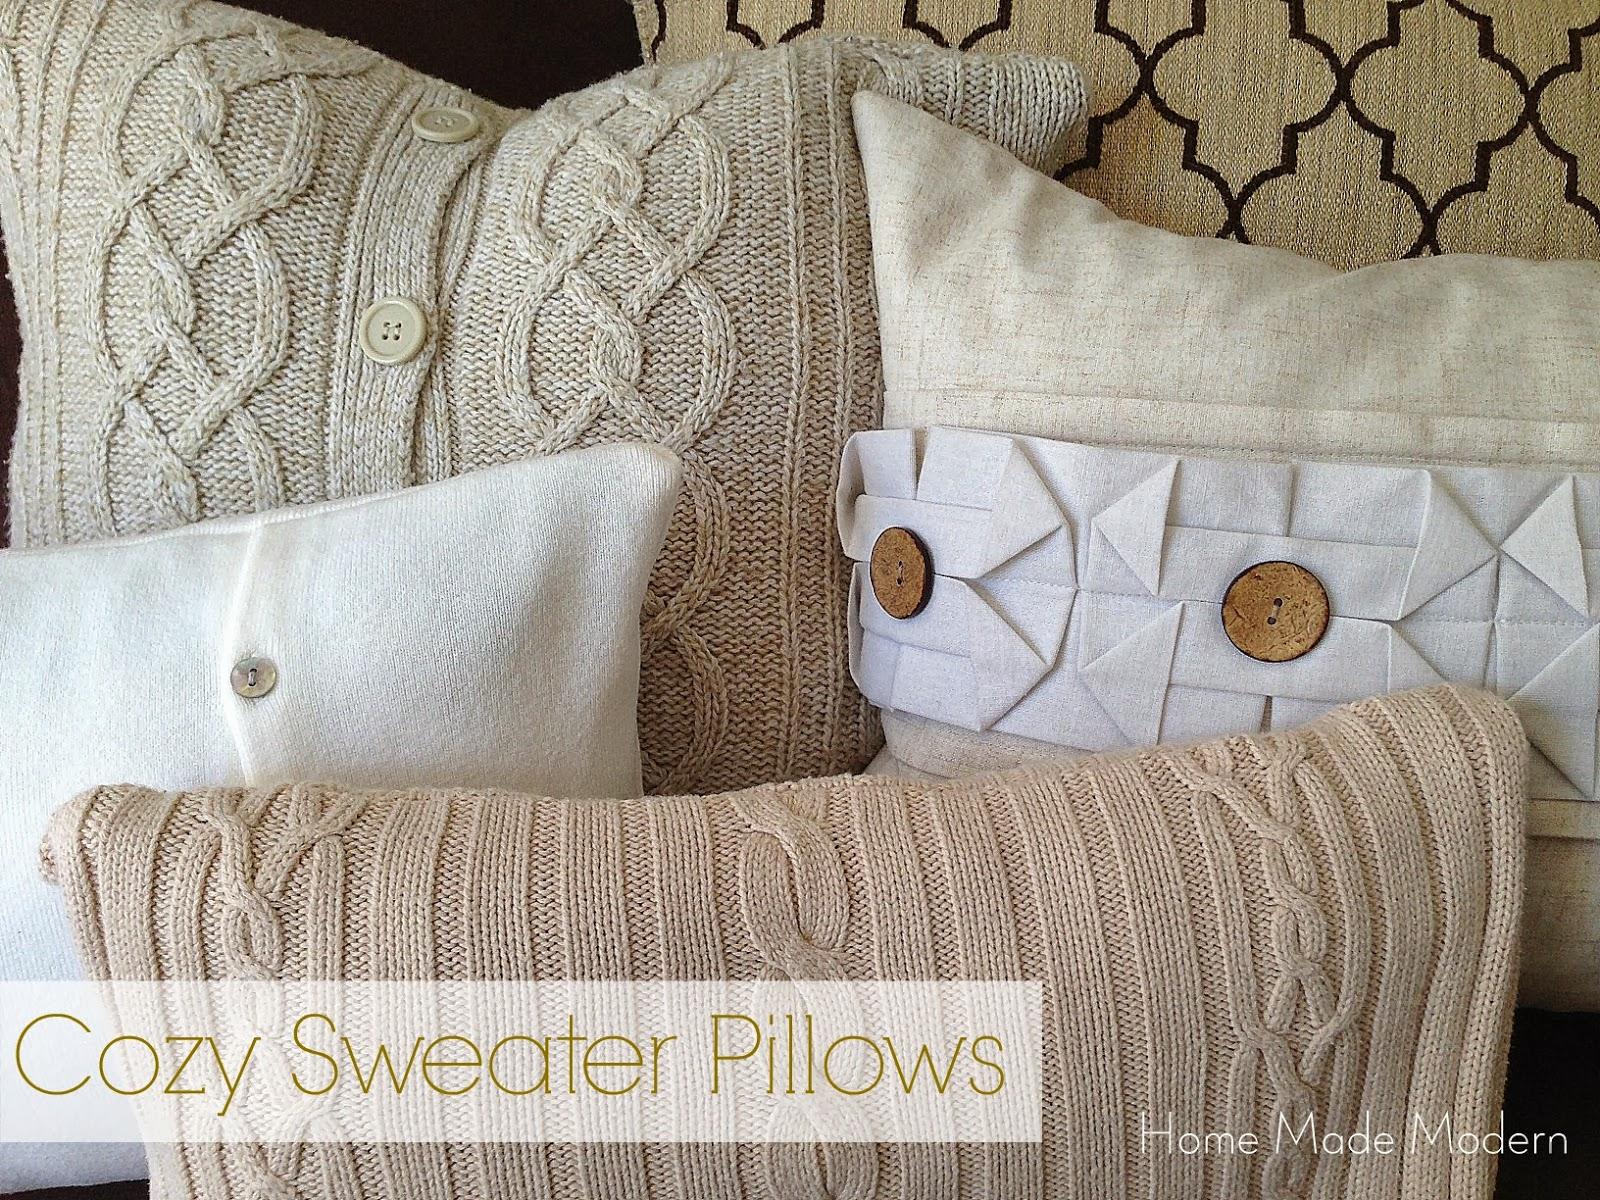 Home Made Modern: Copycat Craft: Cozy Sweater Pillows